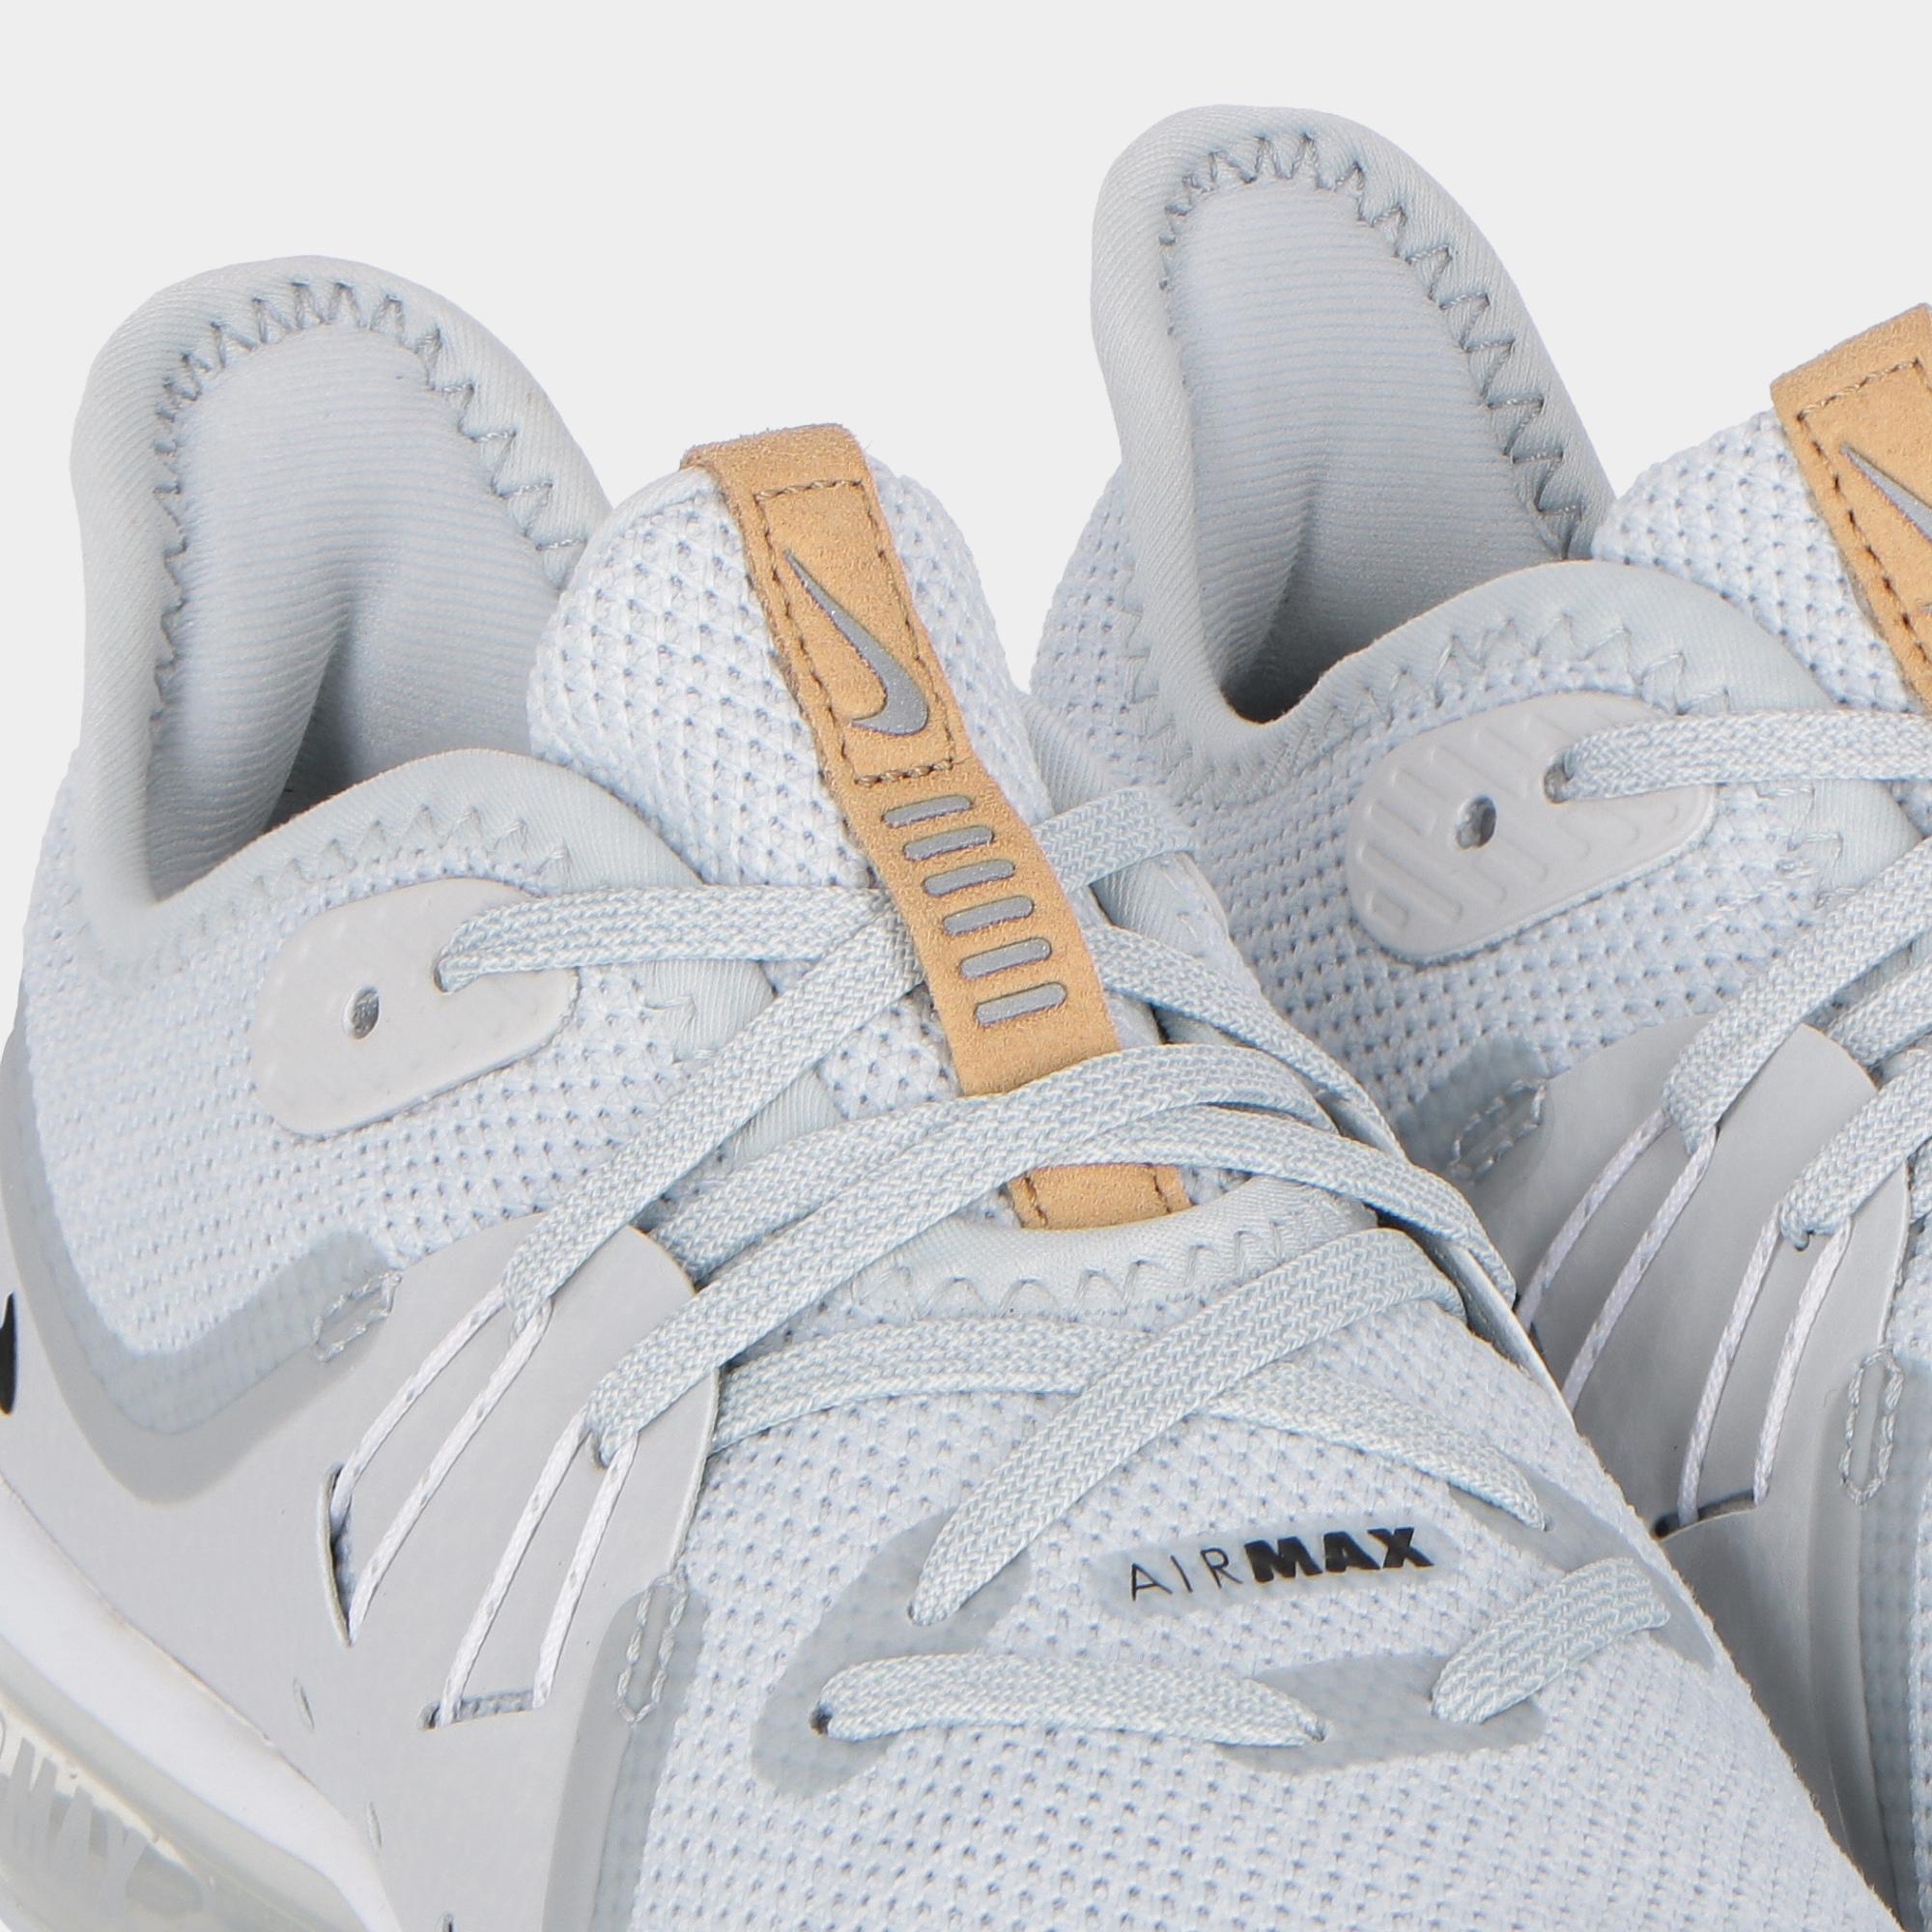 newest ae43f 25ec7 Nike Air Max Sequent 3 Platinum black white